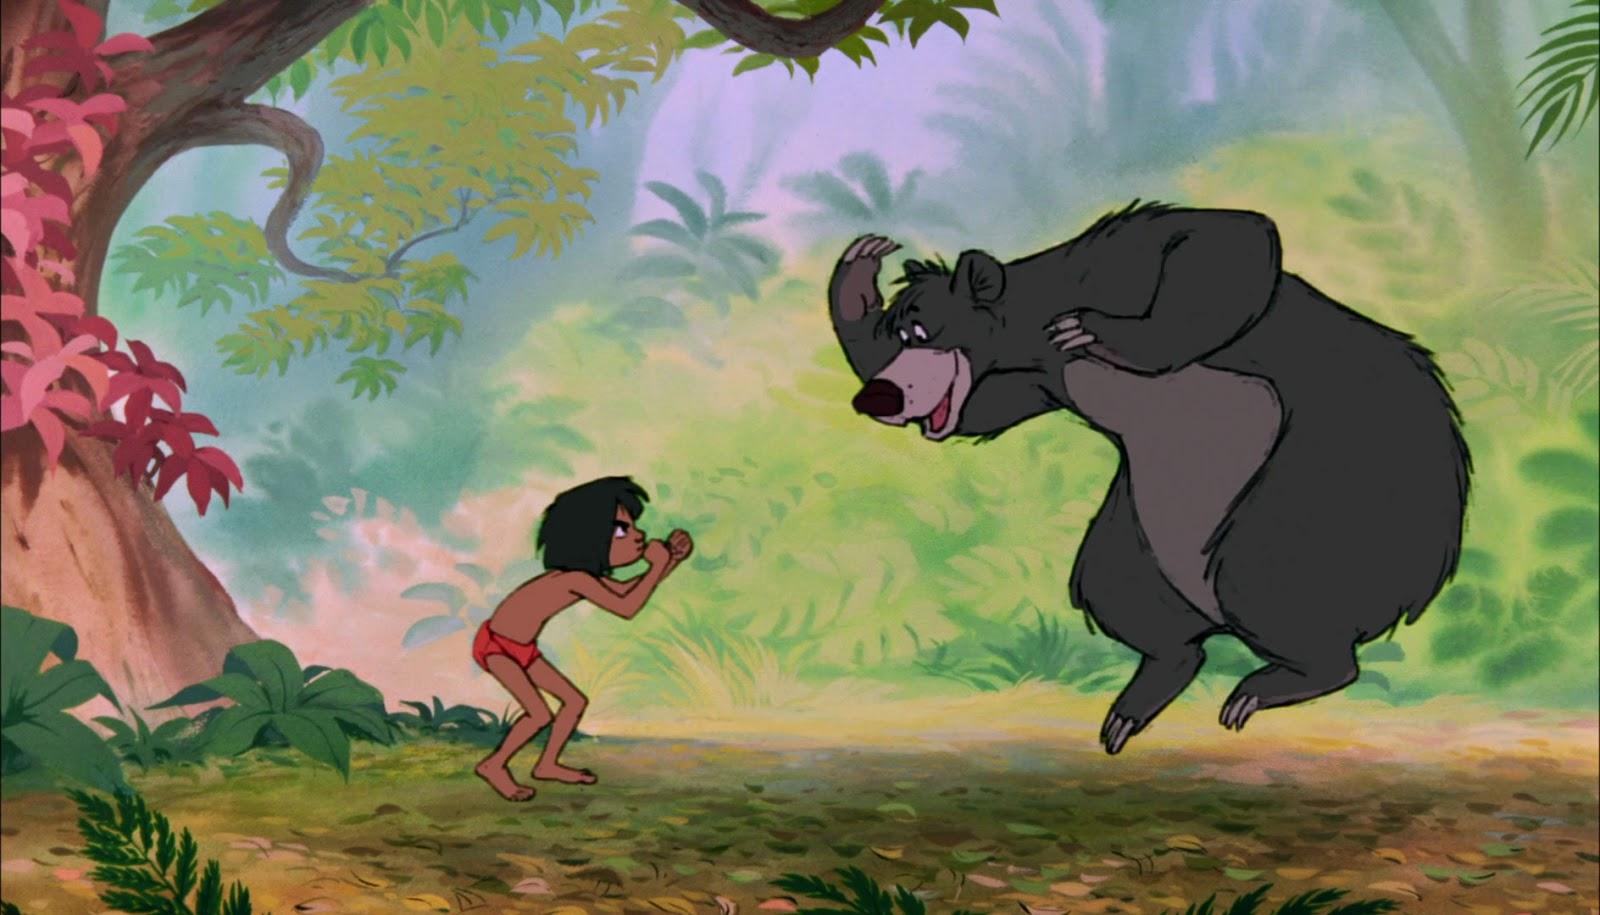 mowgli and baloo relationship memes